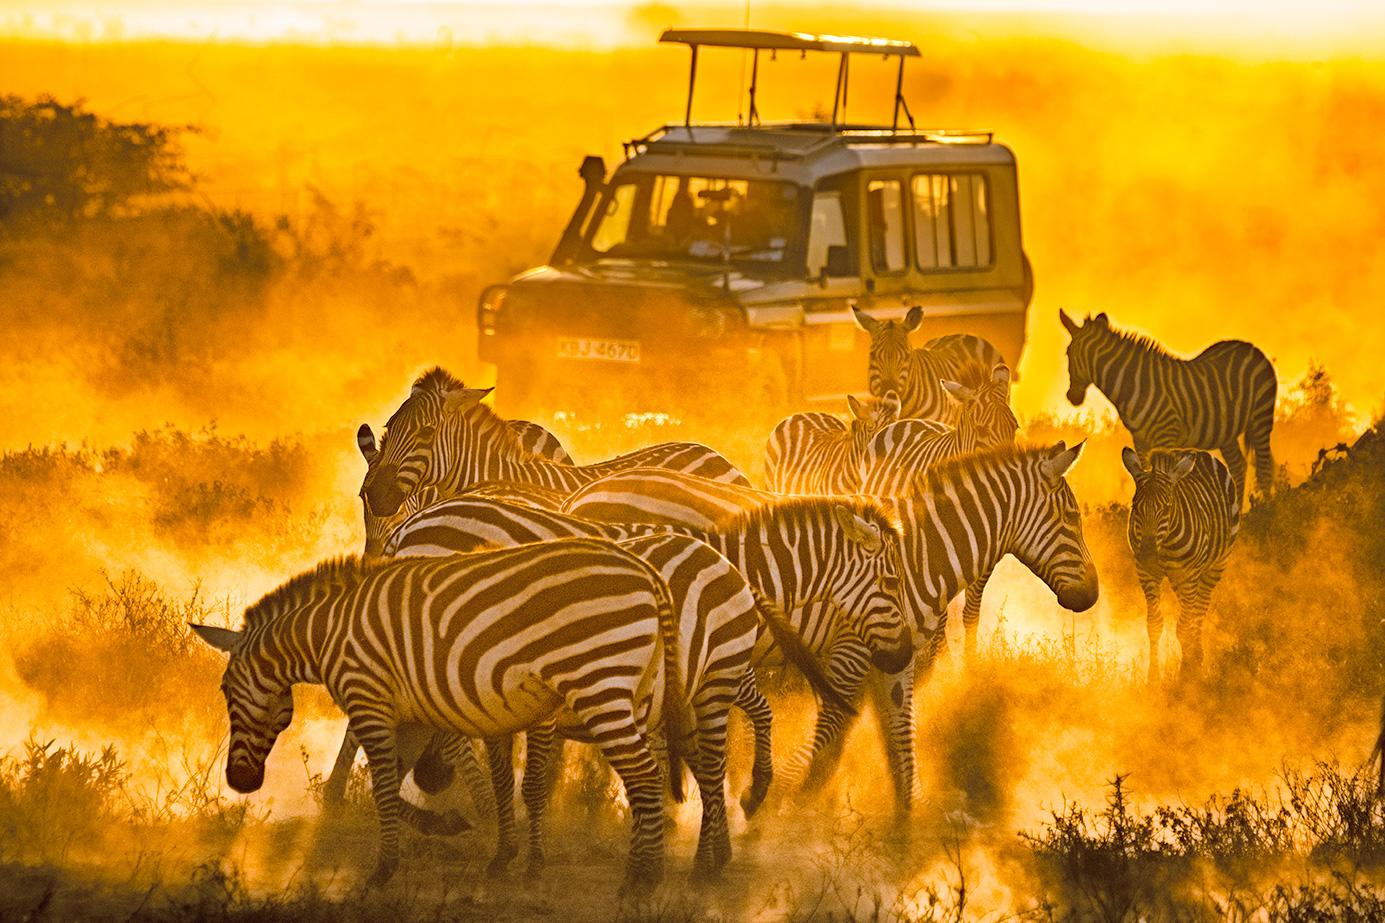 Kenia-Fotoreise - Amboseli Nationalpark - Sonnenuntergang - Zebras - Staub